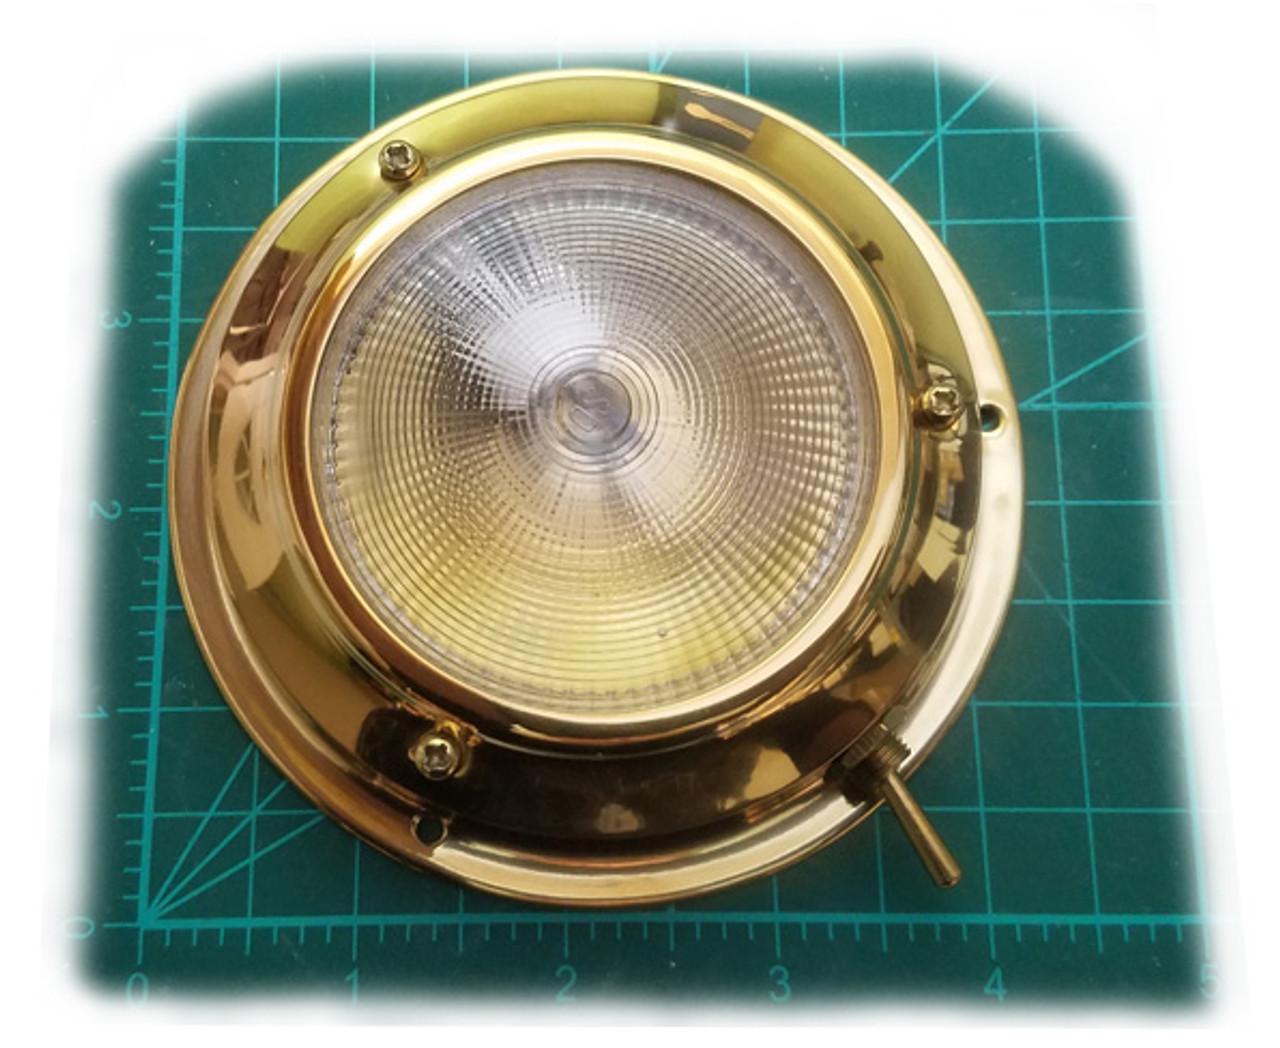 "4.25"" Stainless Steel or Titanium Nitride Brass G4 Dome Light (FX-425-G4)"